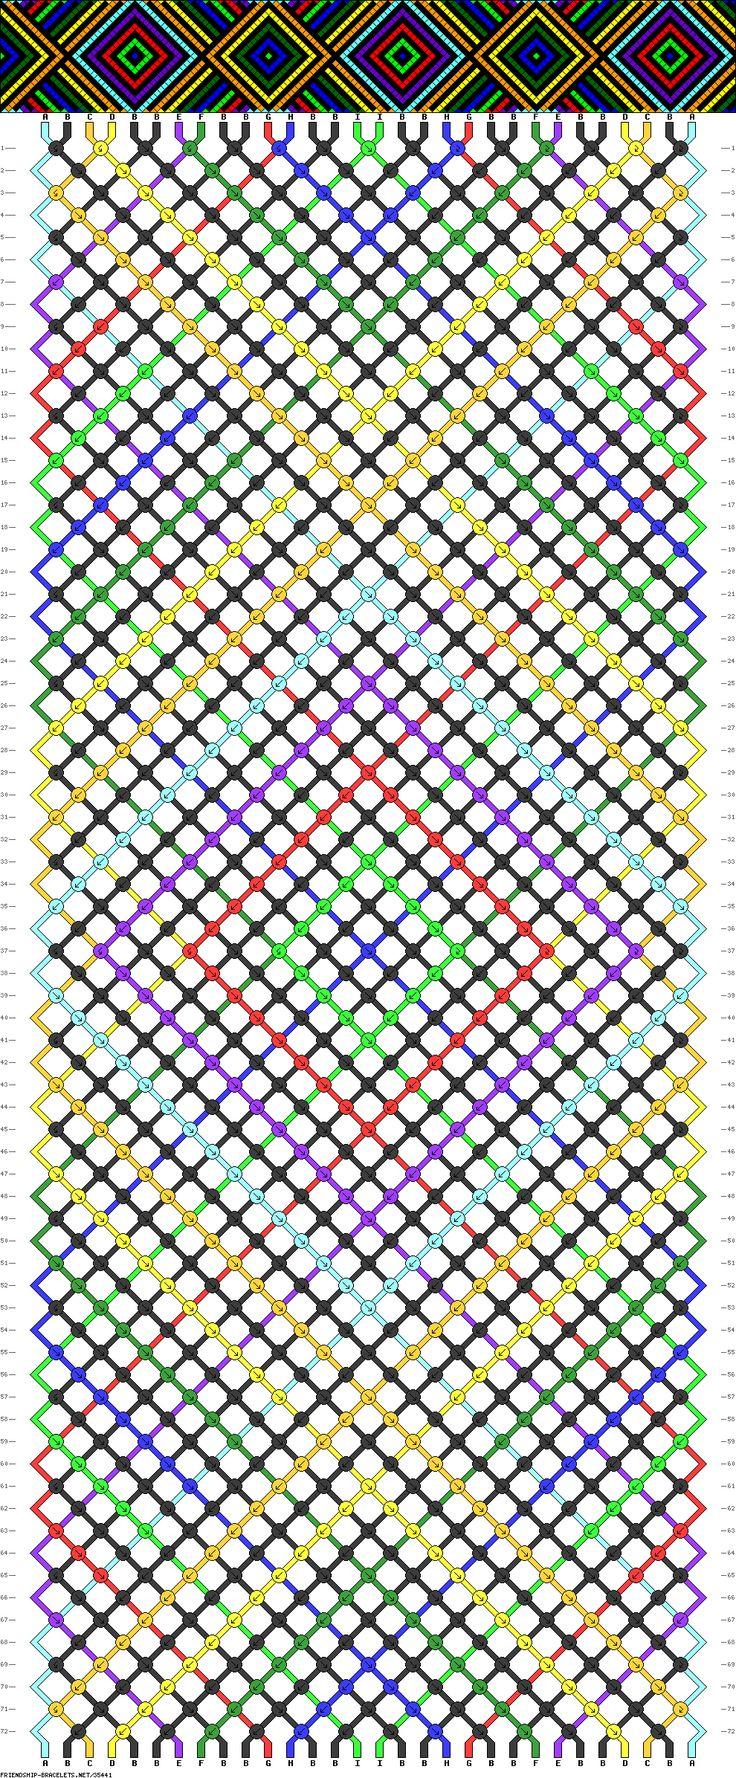 30 strings, 9 colors, 72 rows